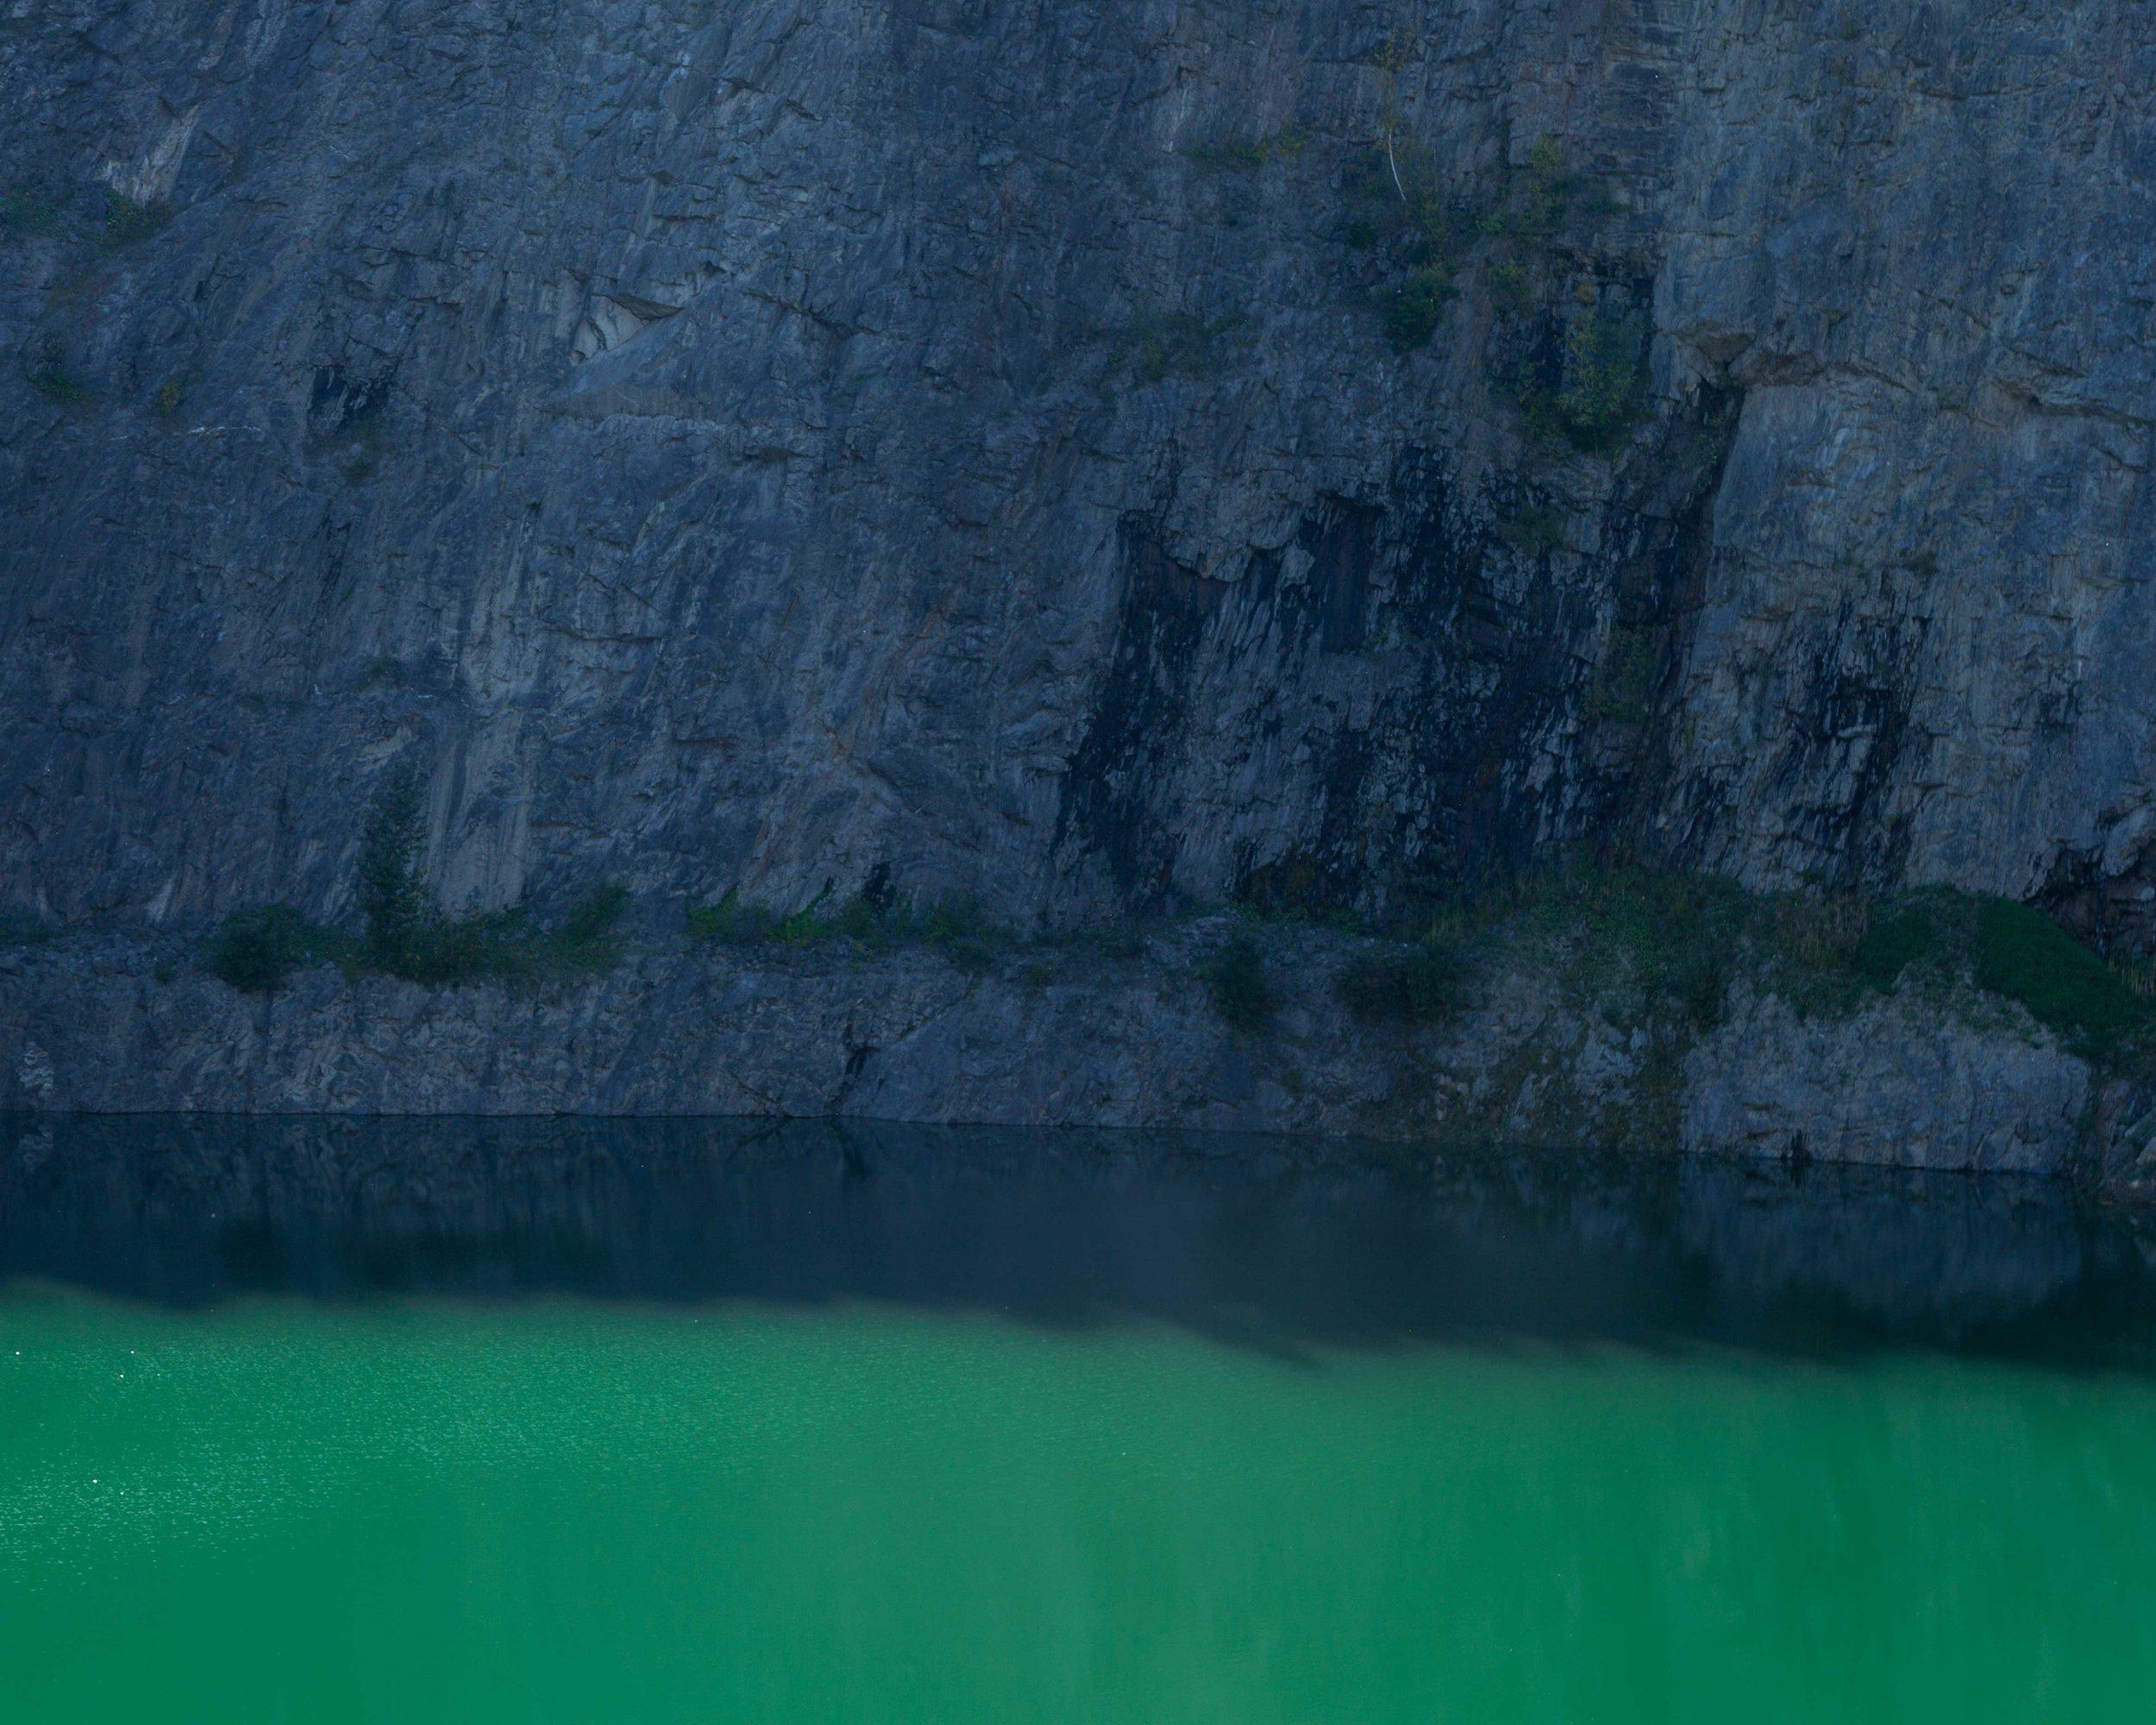 PIke-quarry-pit-8x10.jpg